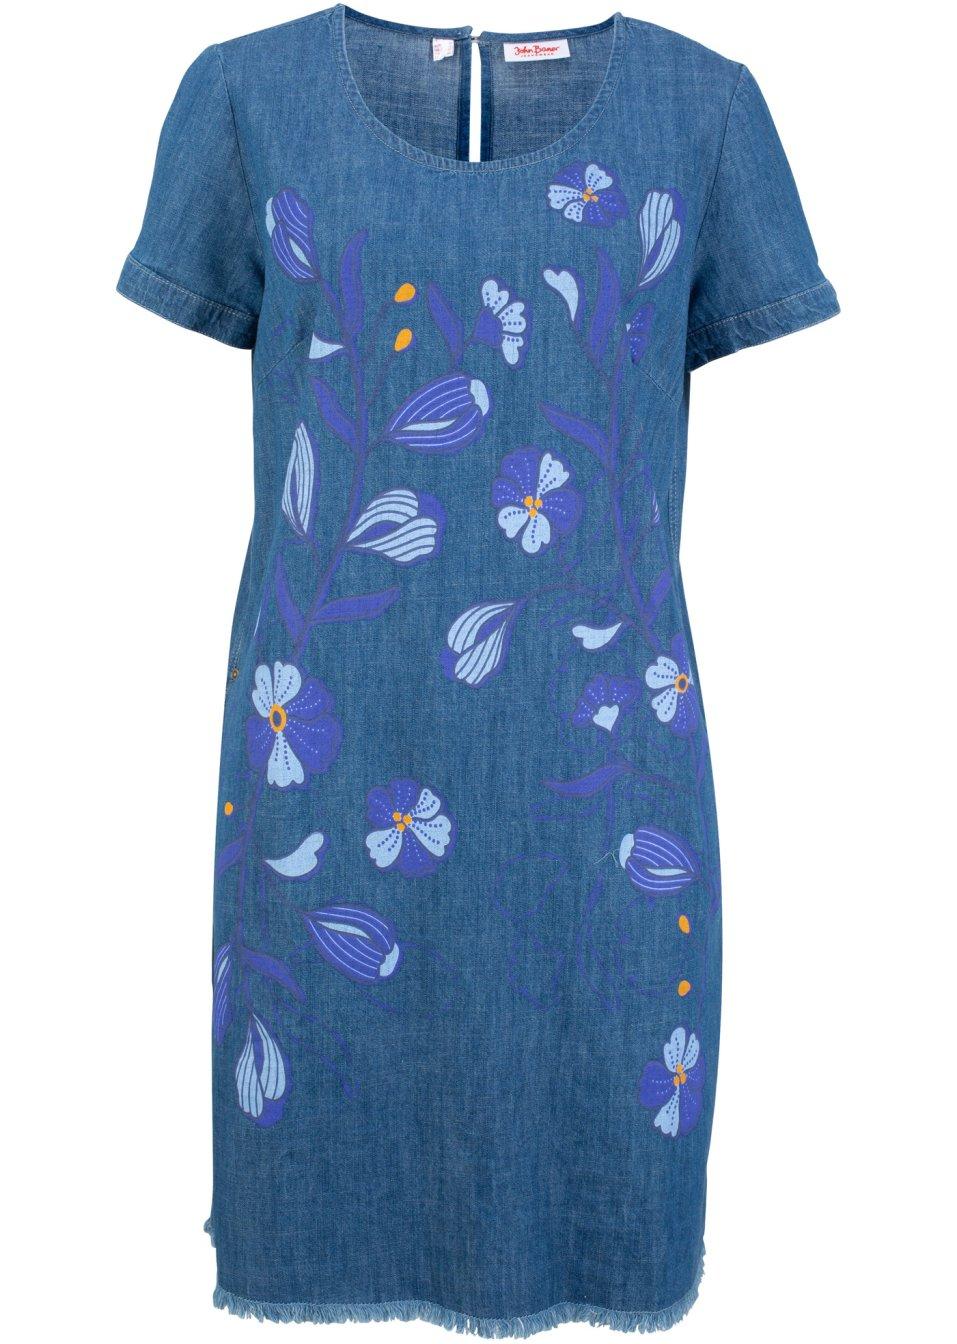 Jeanskleid bedruckt Kurzarm hellblau bedruckt - Damen - John Baner JEANSWEAR - bonprix.de bc12R Lg95V